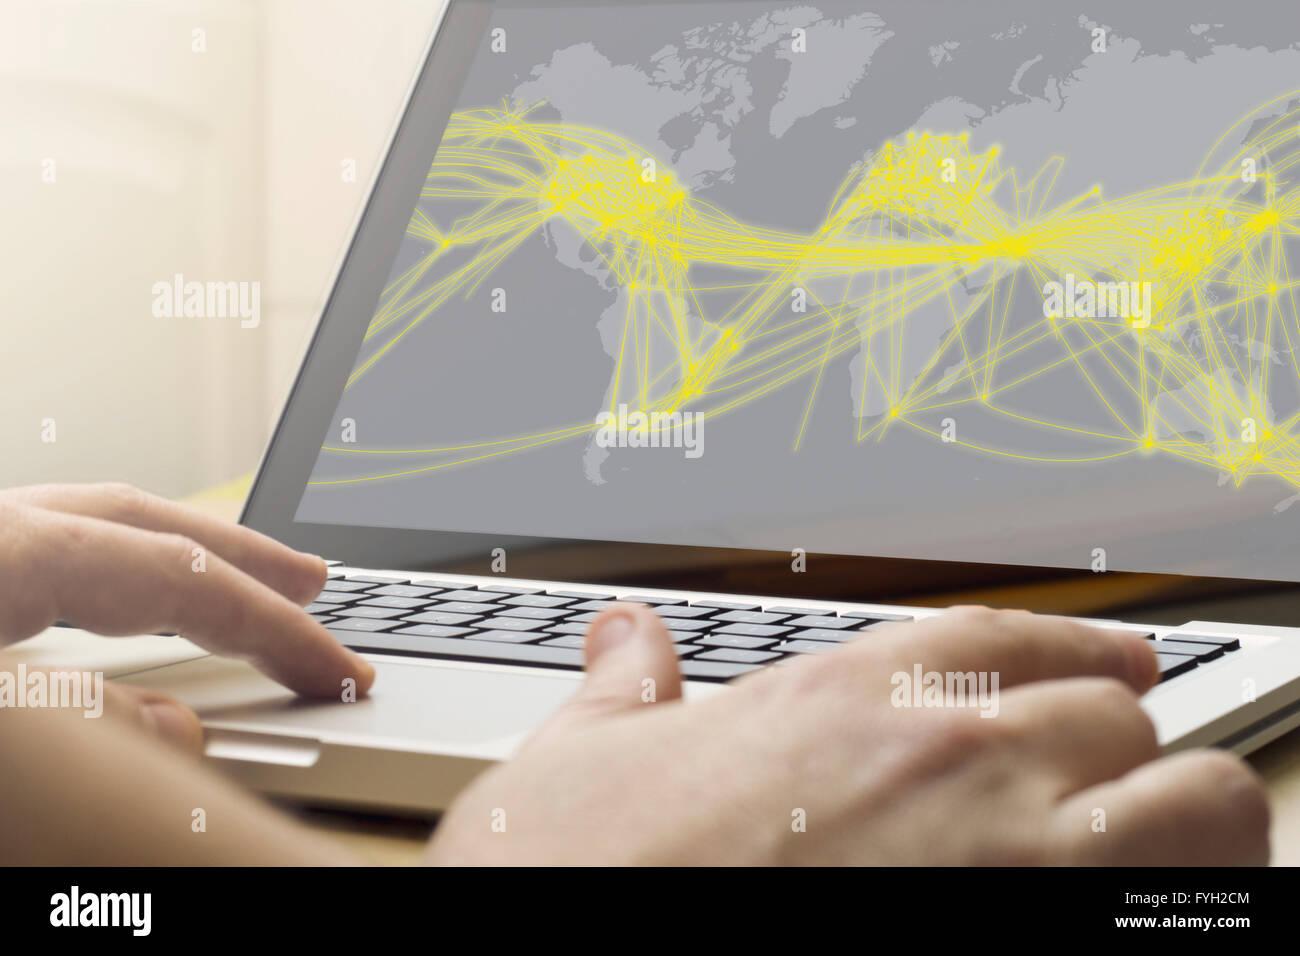 Concepto de conexión mundial: El Hombre con ordenador portátil con conexión mundial mapa en la pantalla Imagen De Stock